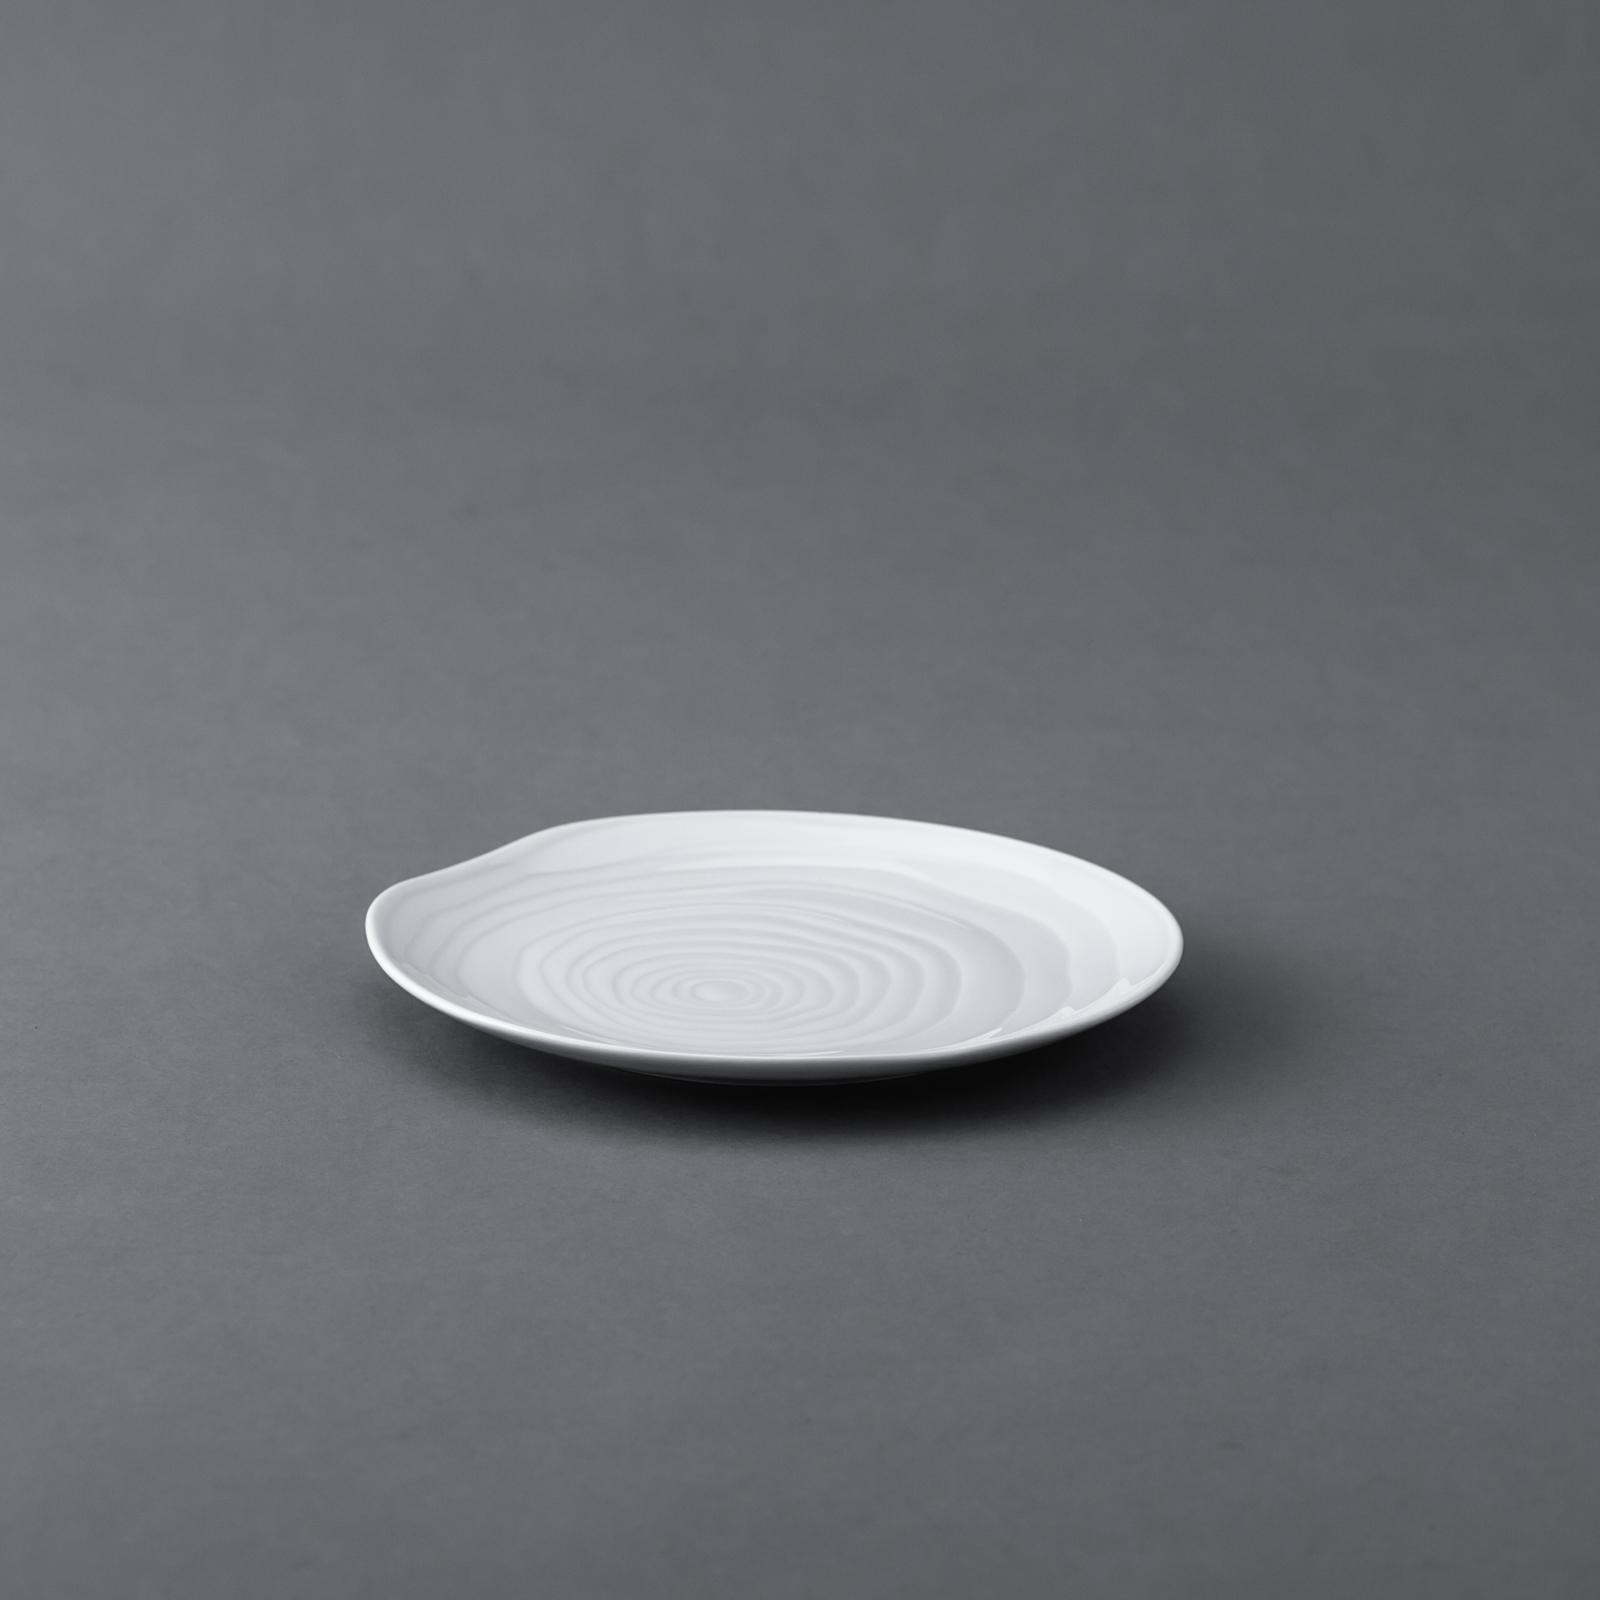 PILLIVUYT _ オービエ プレート 16.5cm